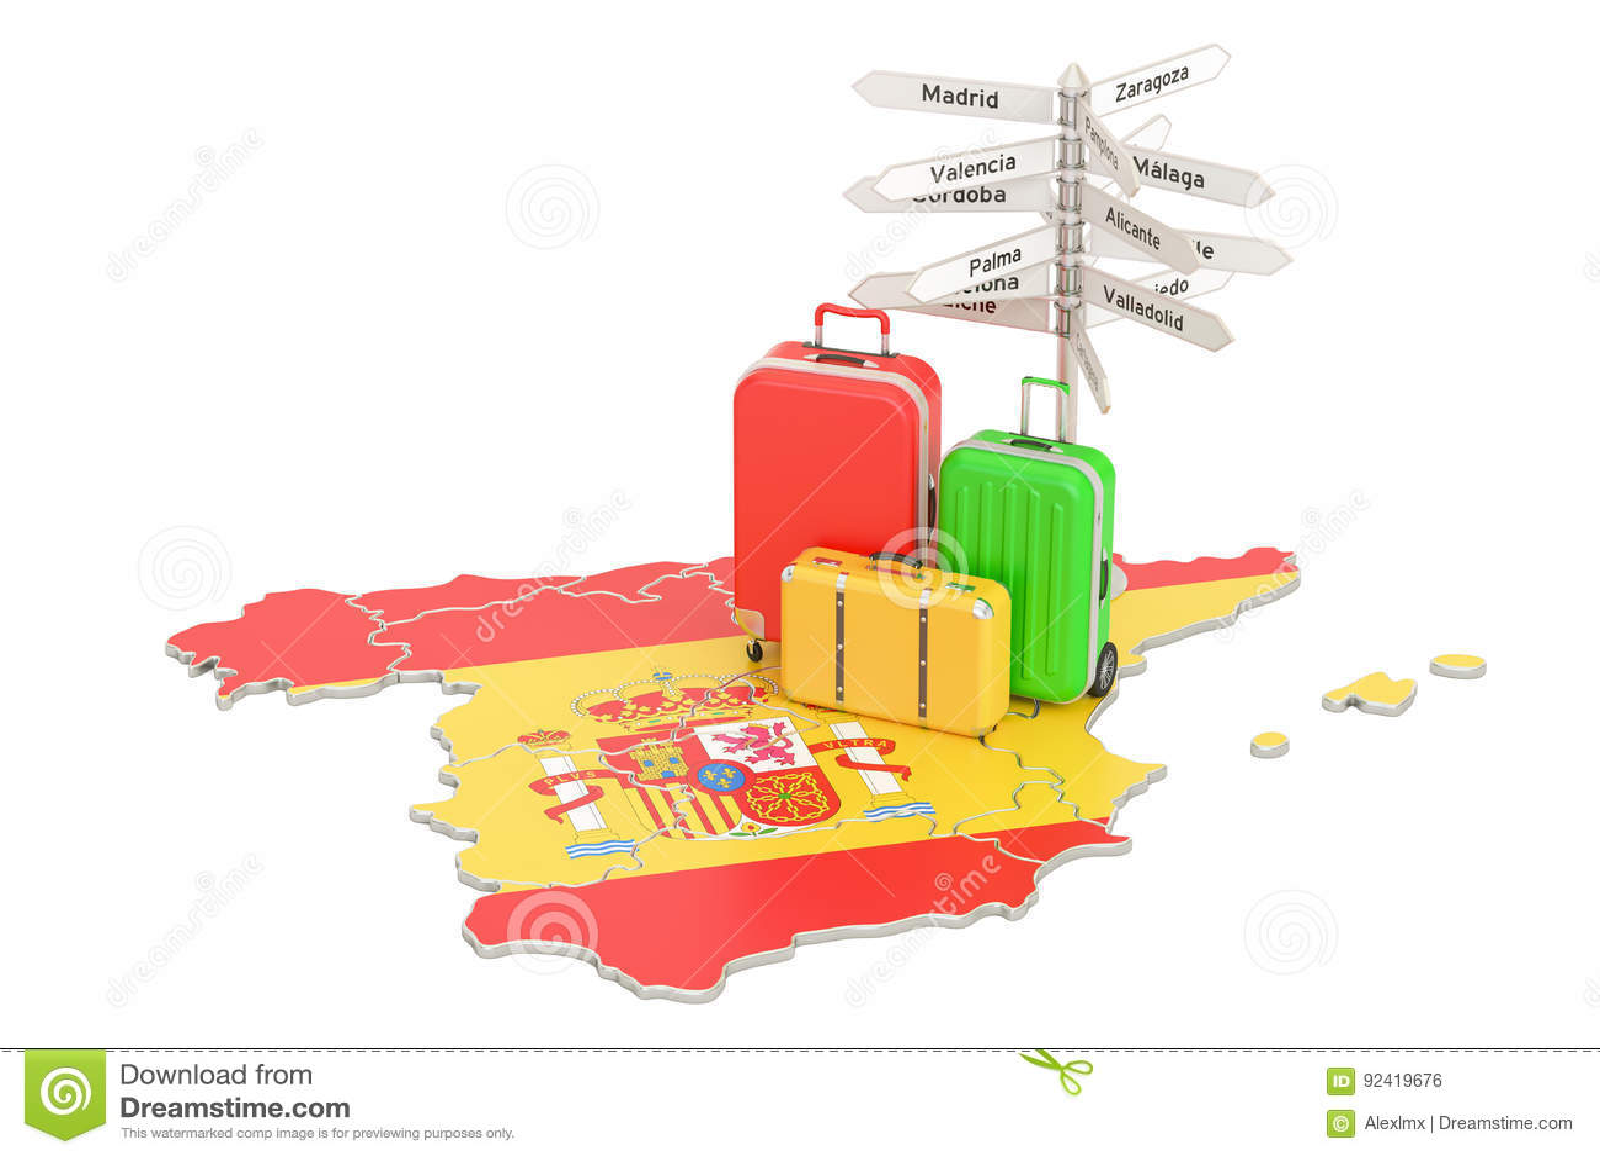 De reisconcept van Spanje Spaanse vlag op kaart met koffers en sig